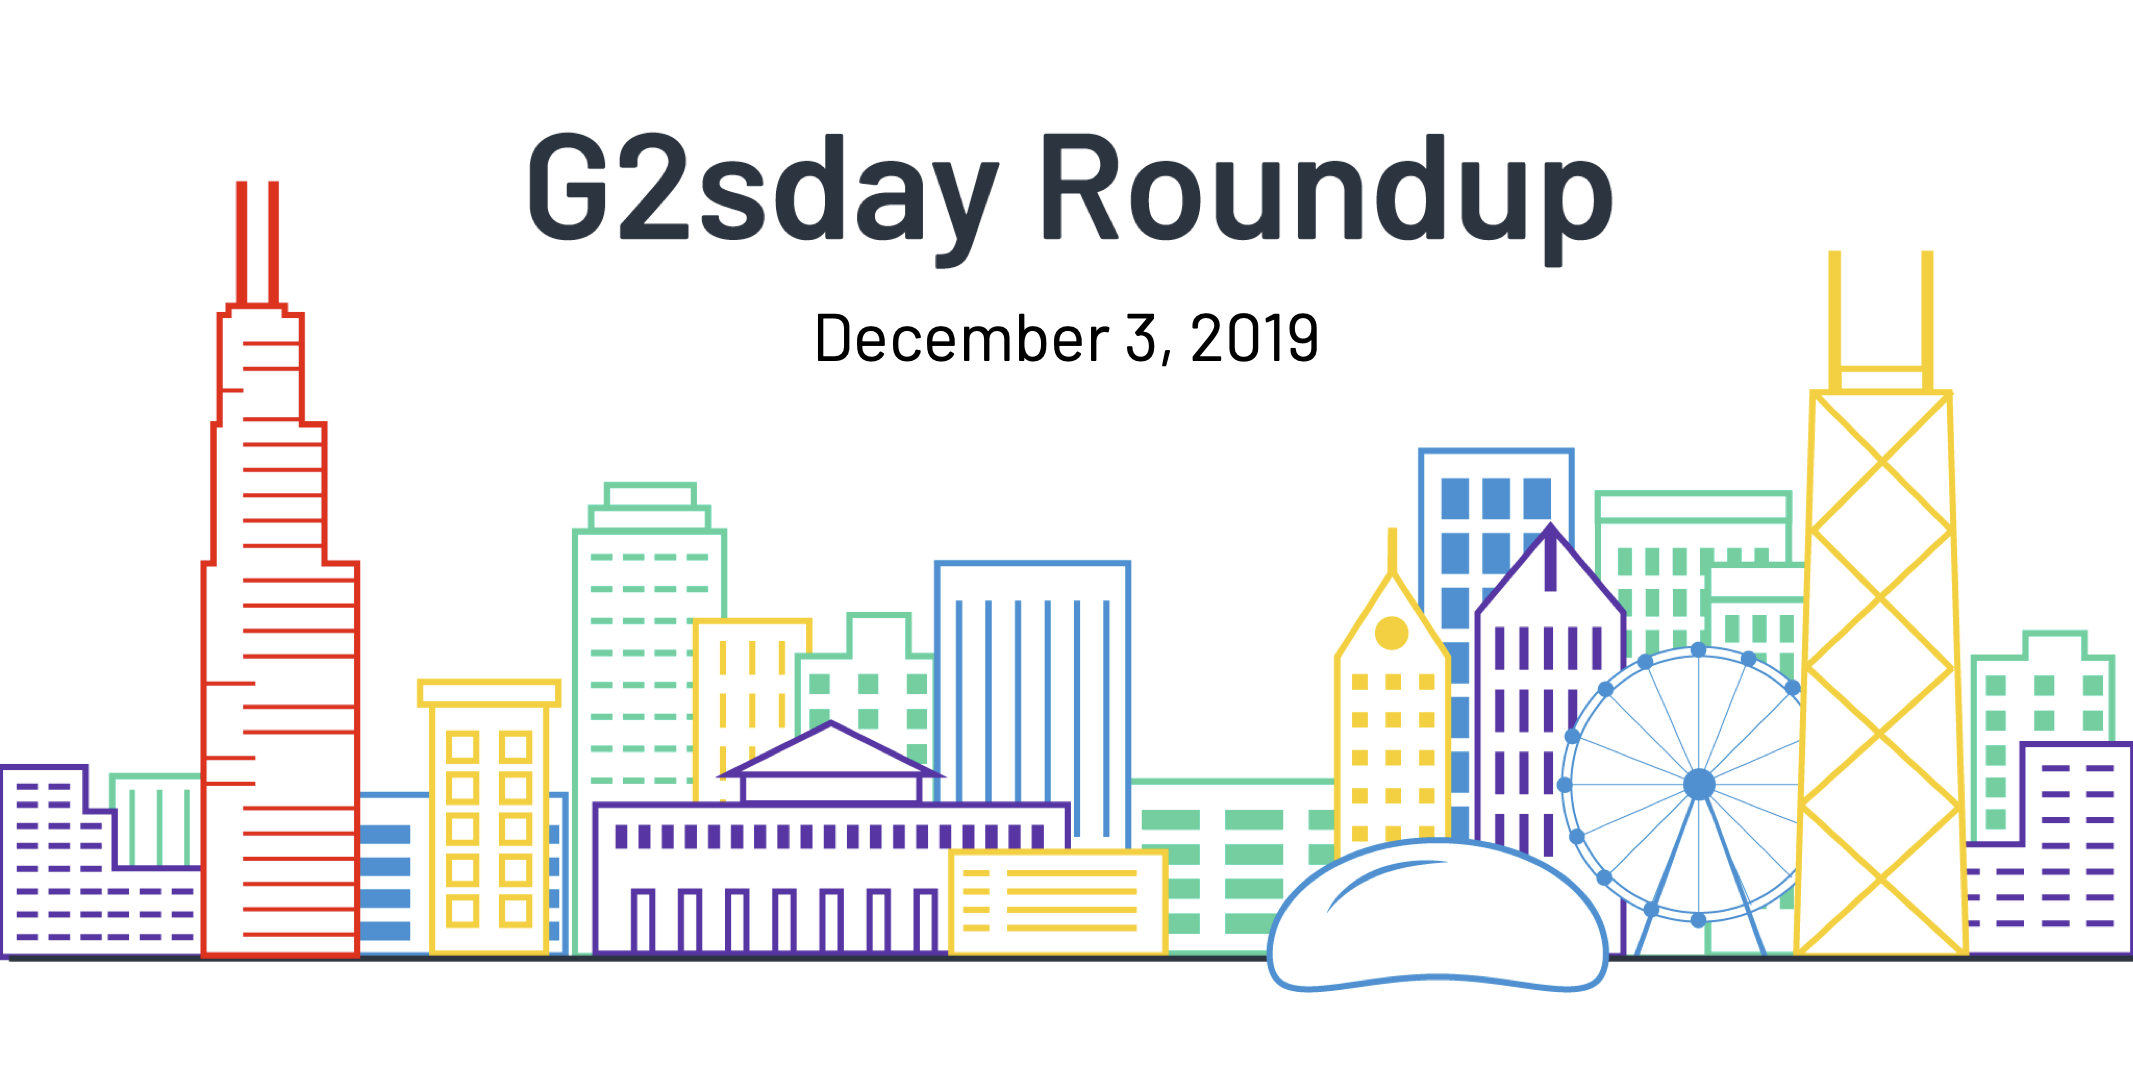 G2sday Roundup December 3 2019